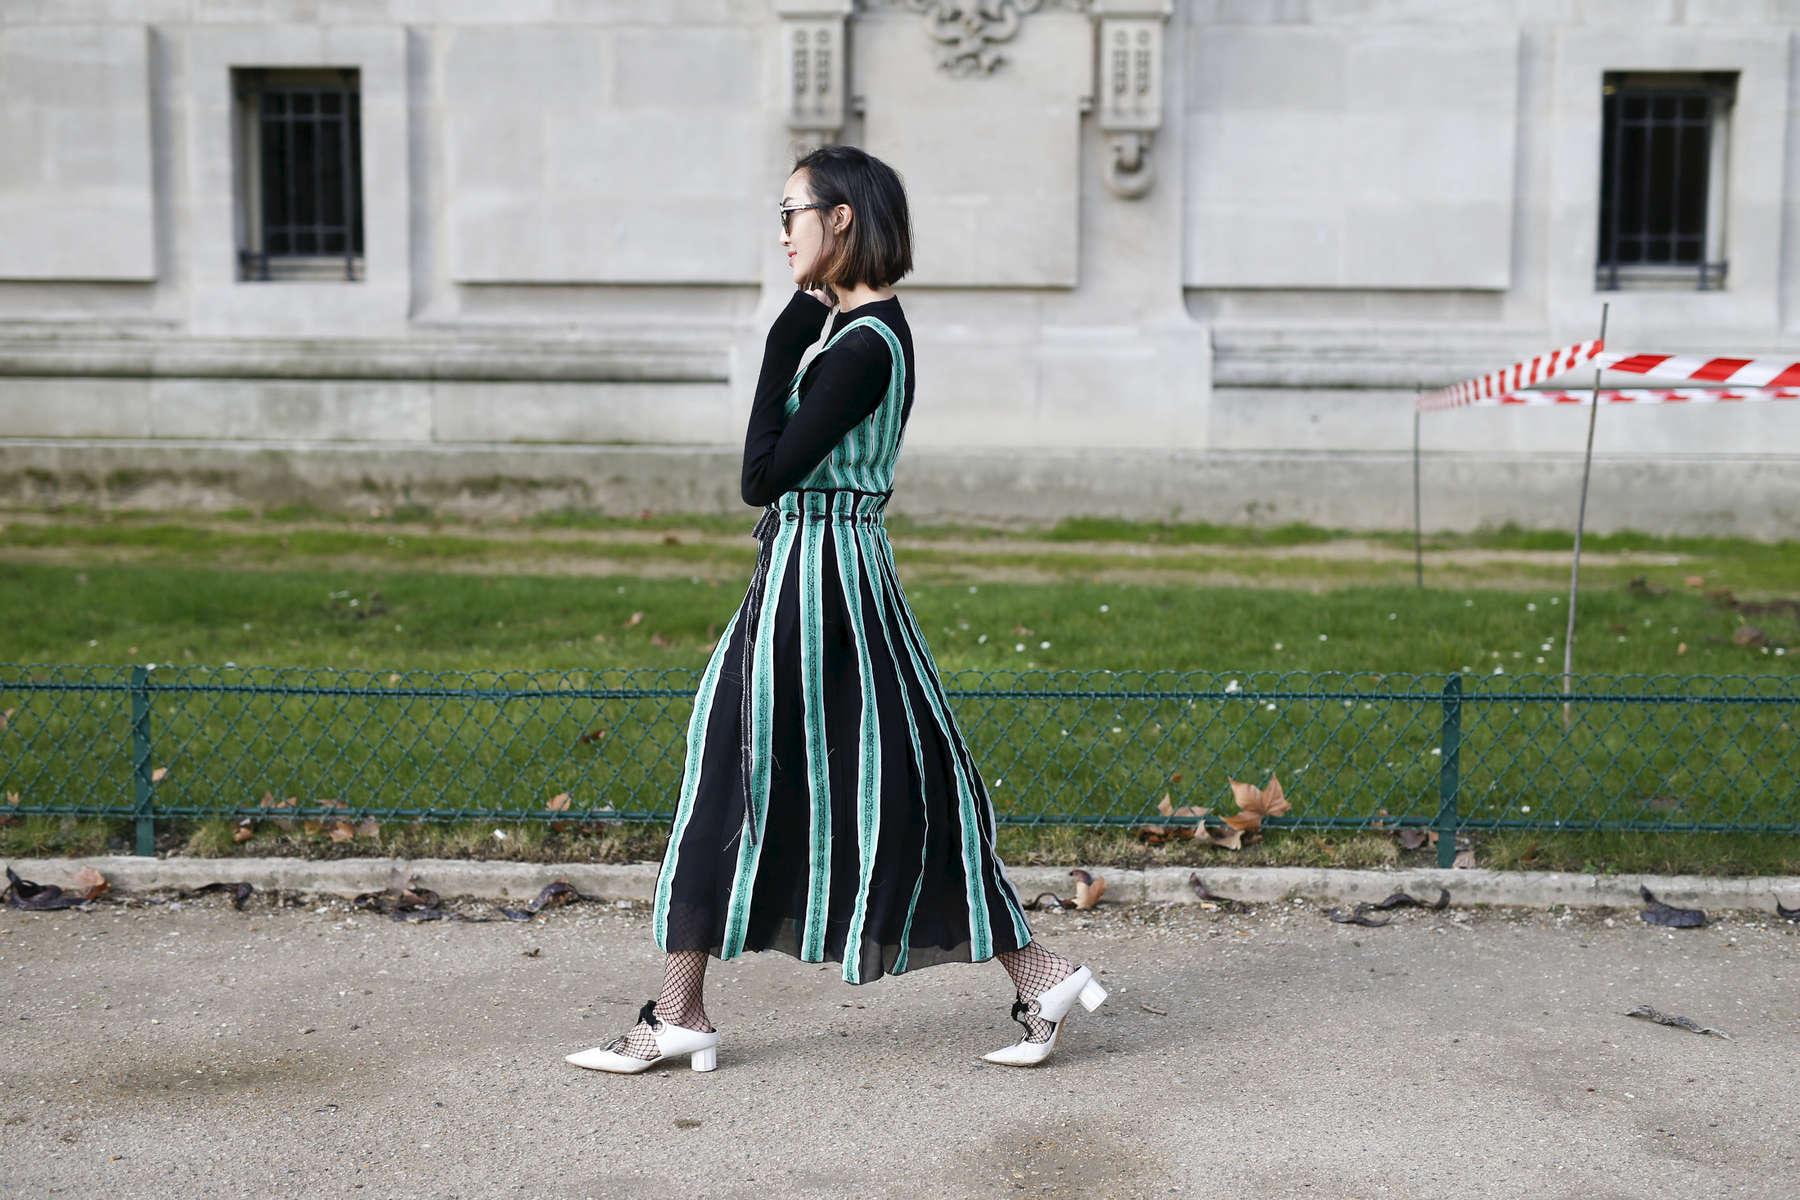 Chriselle Lim - Paris Fashion Week, March 2016